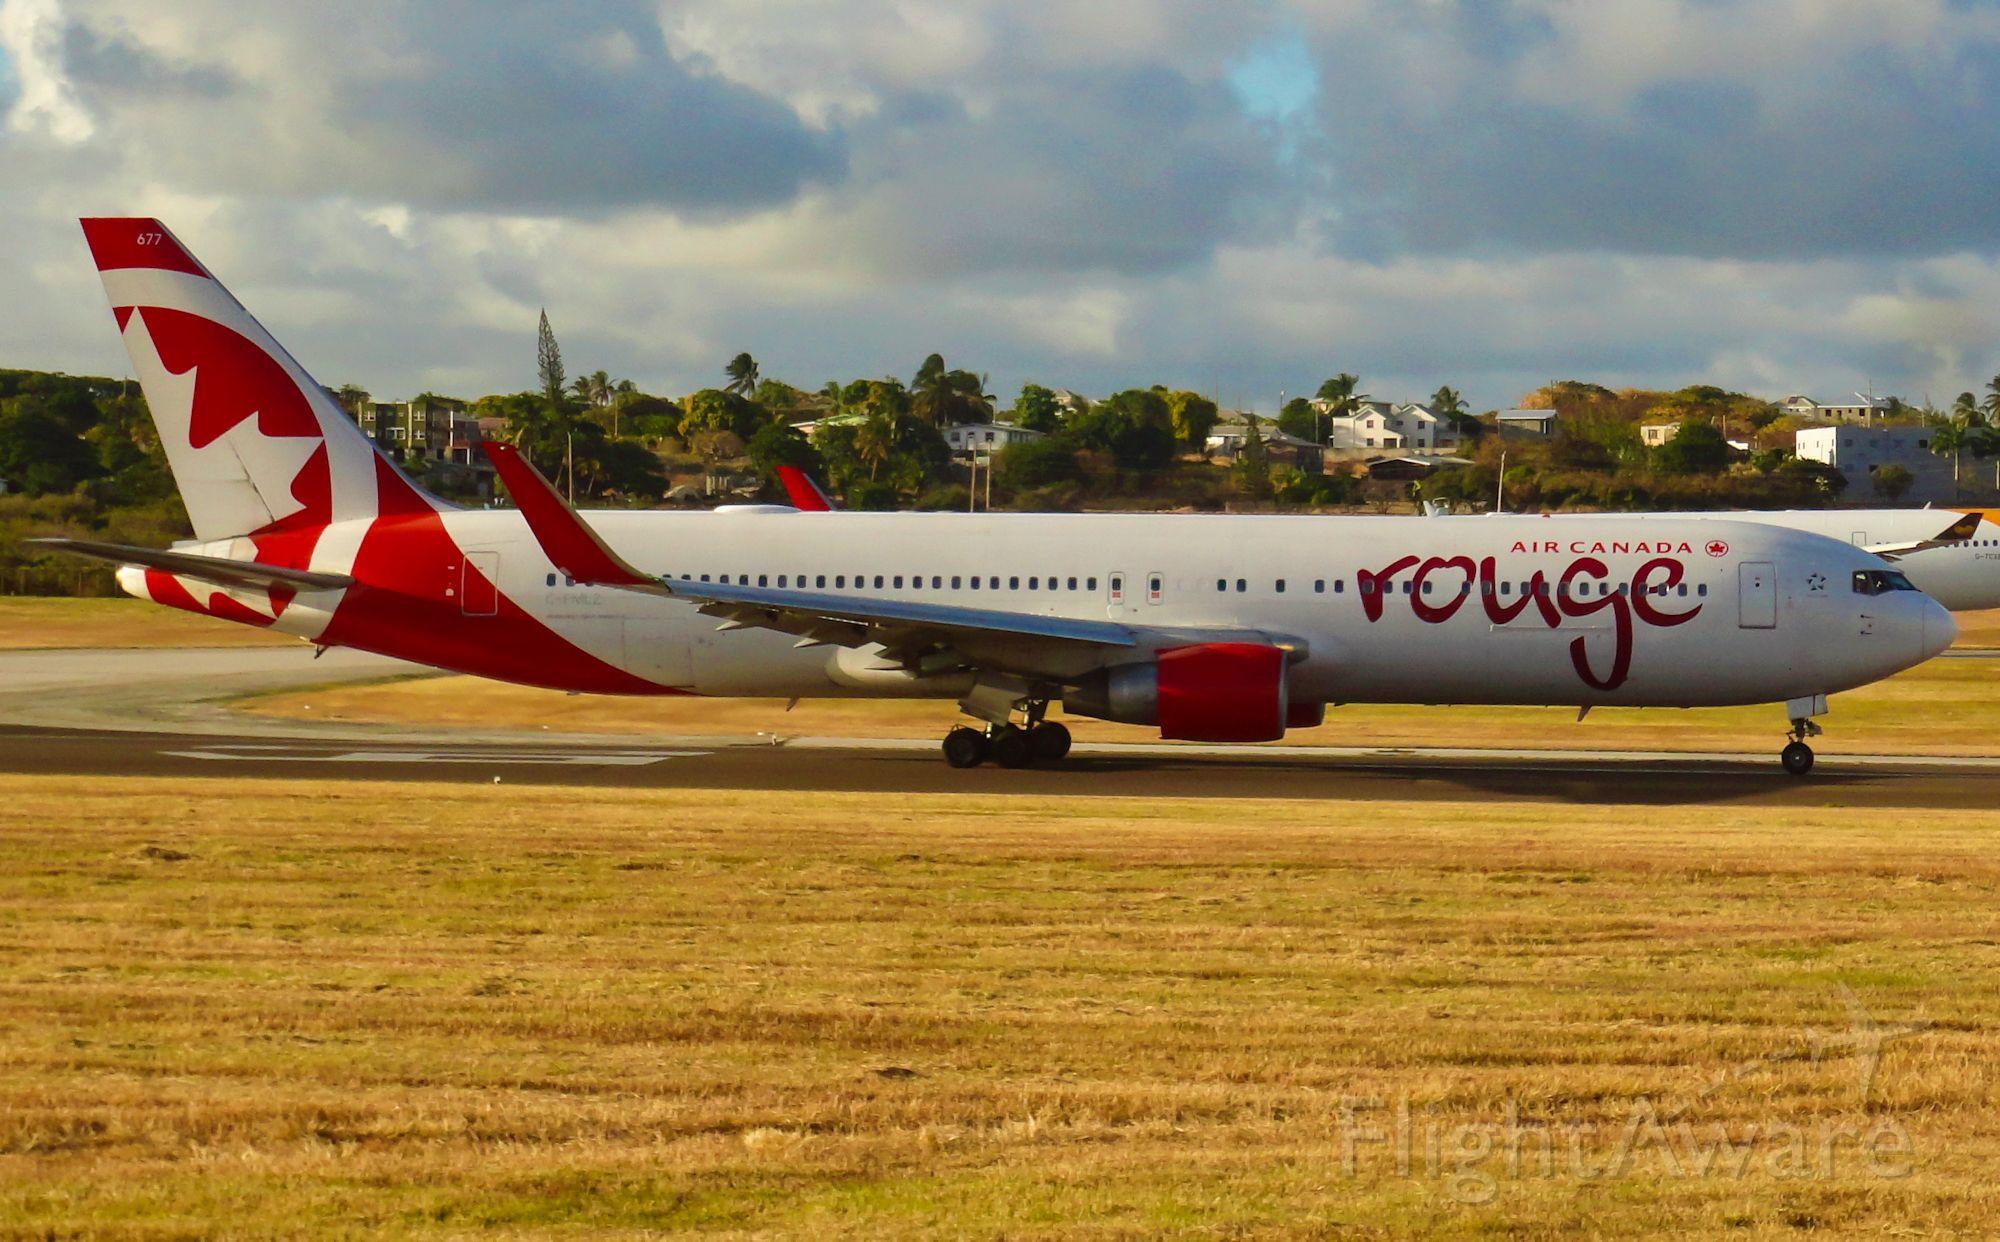 BOEING 767-300 (C-FMLZ) - ROU1715 to Toronto starting takeoff roll on runway 09